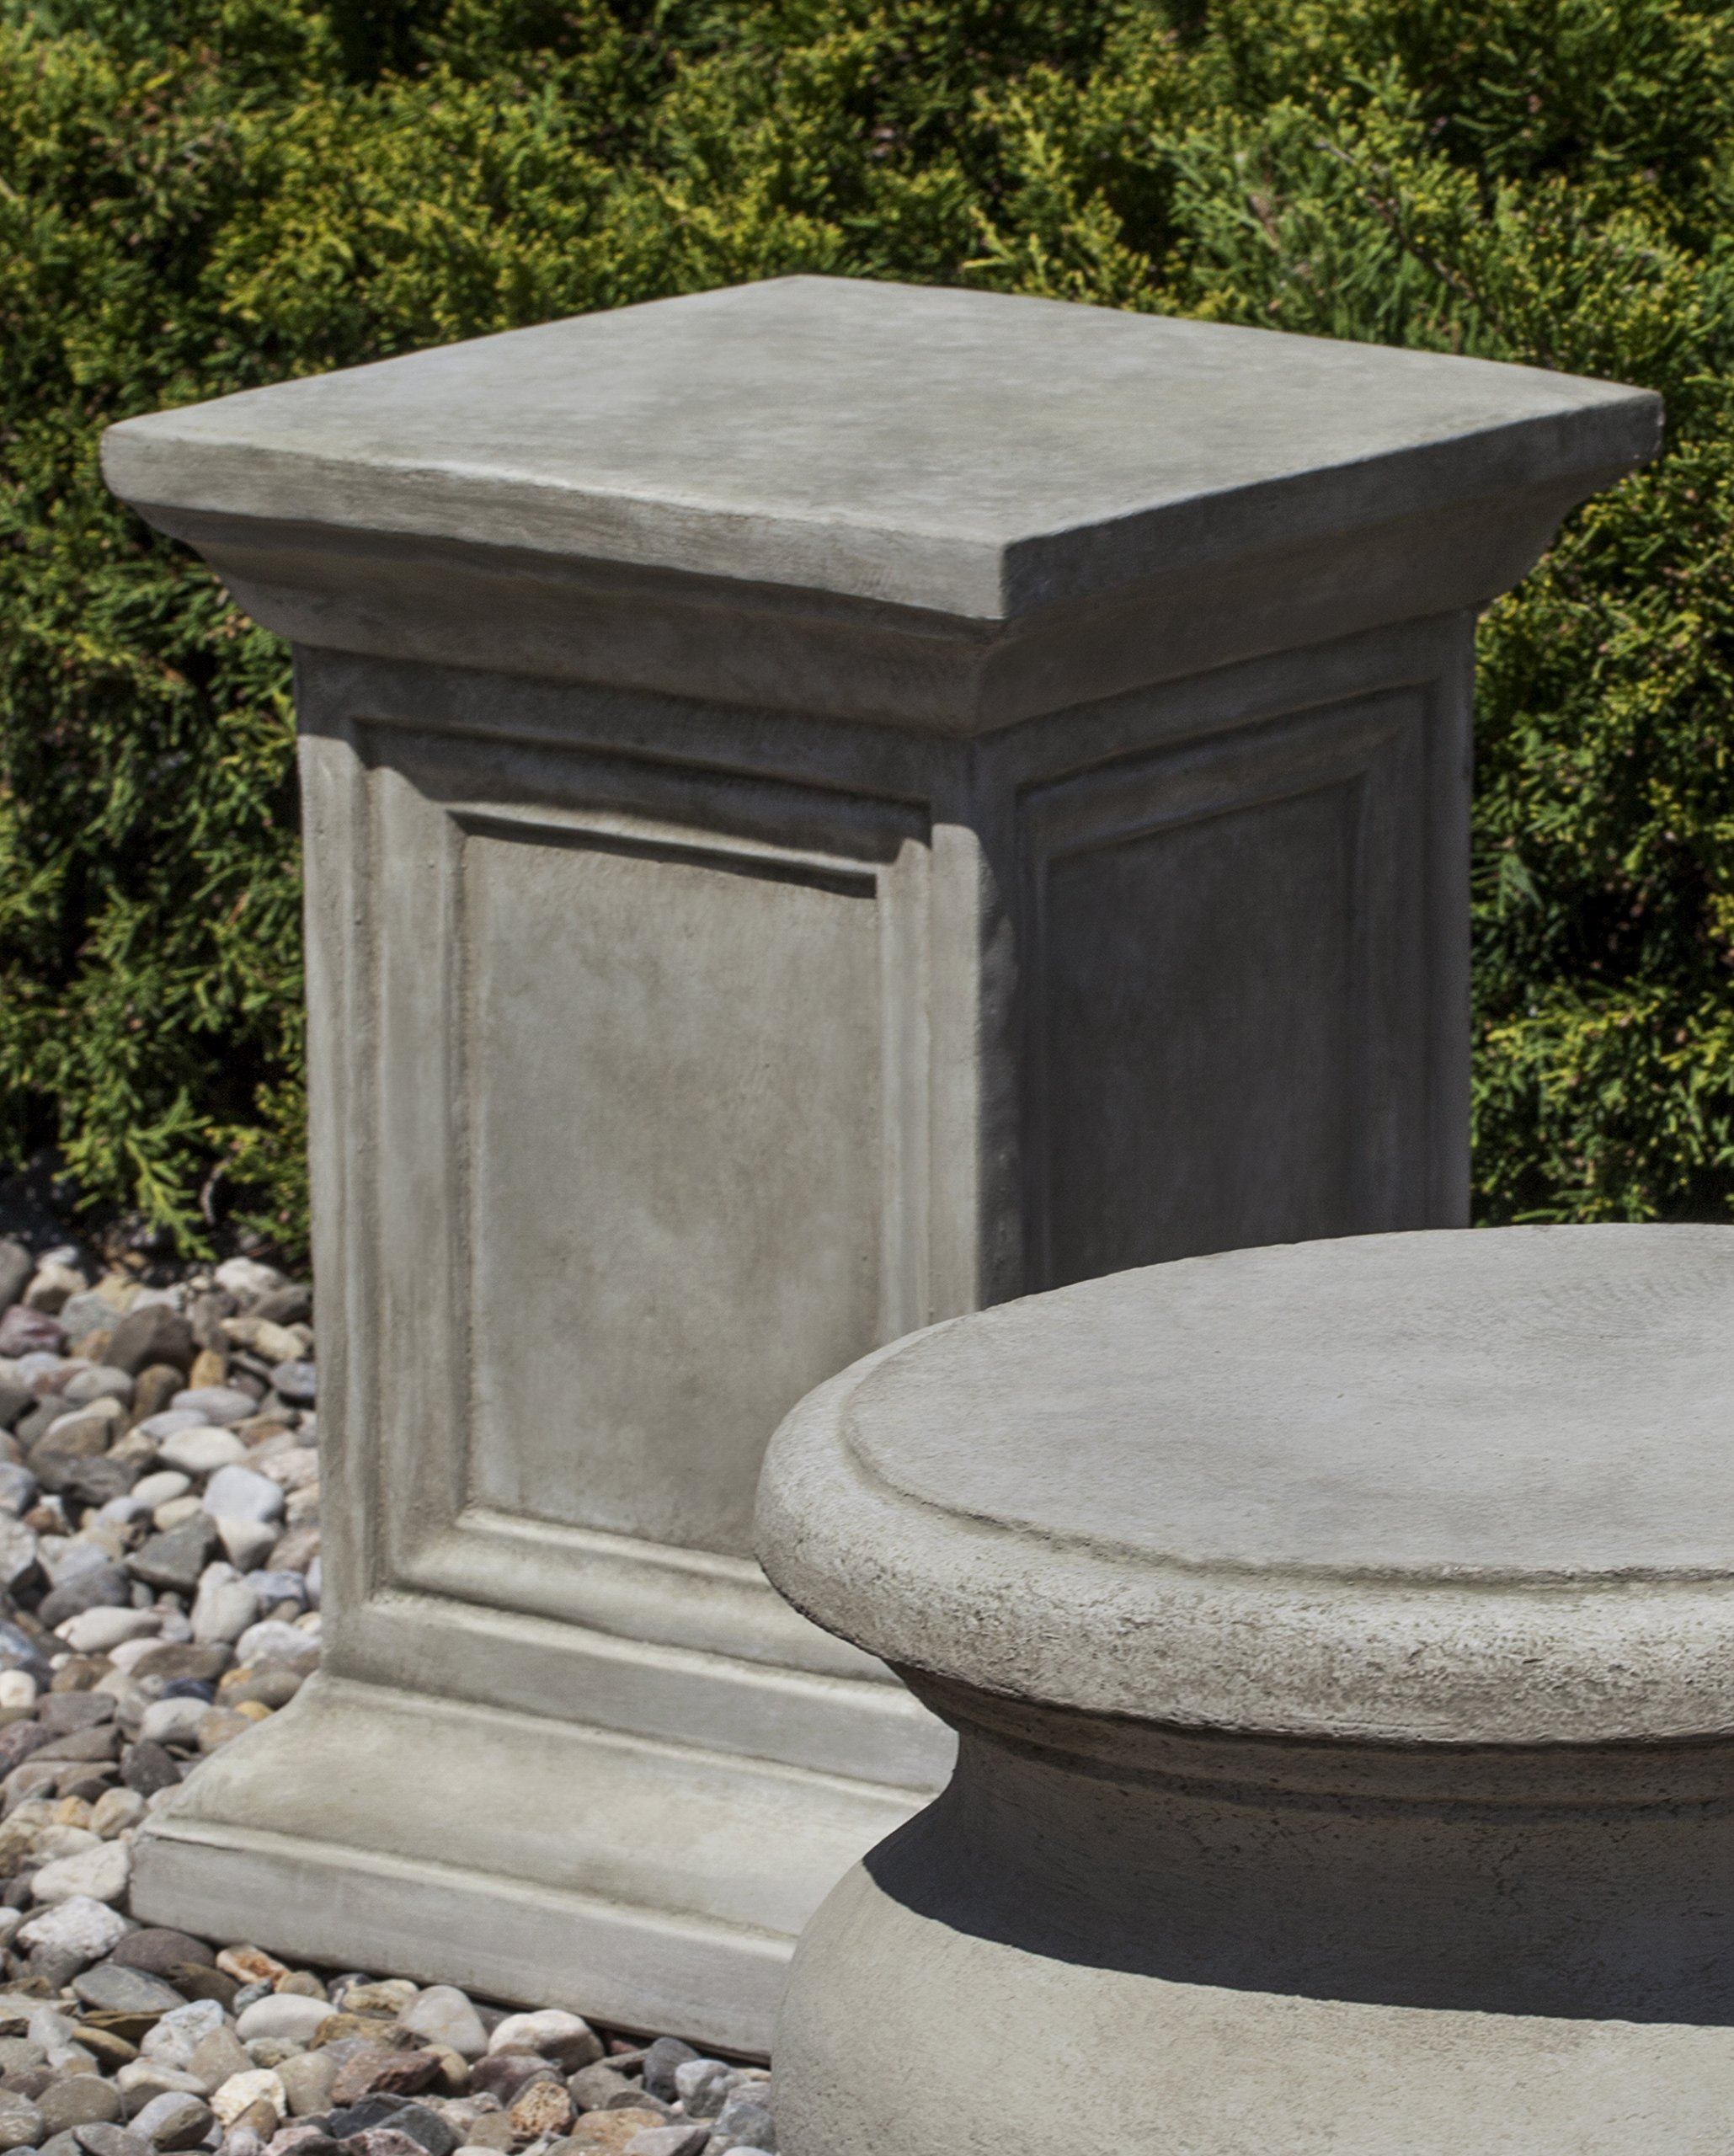 Campania International PD-32-GS Square Pedestal, Grey Stone Finish